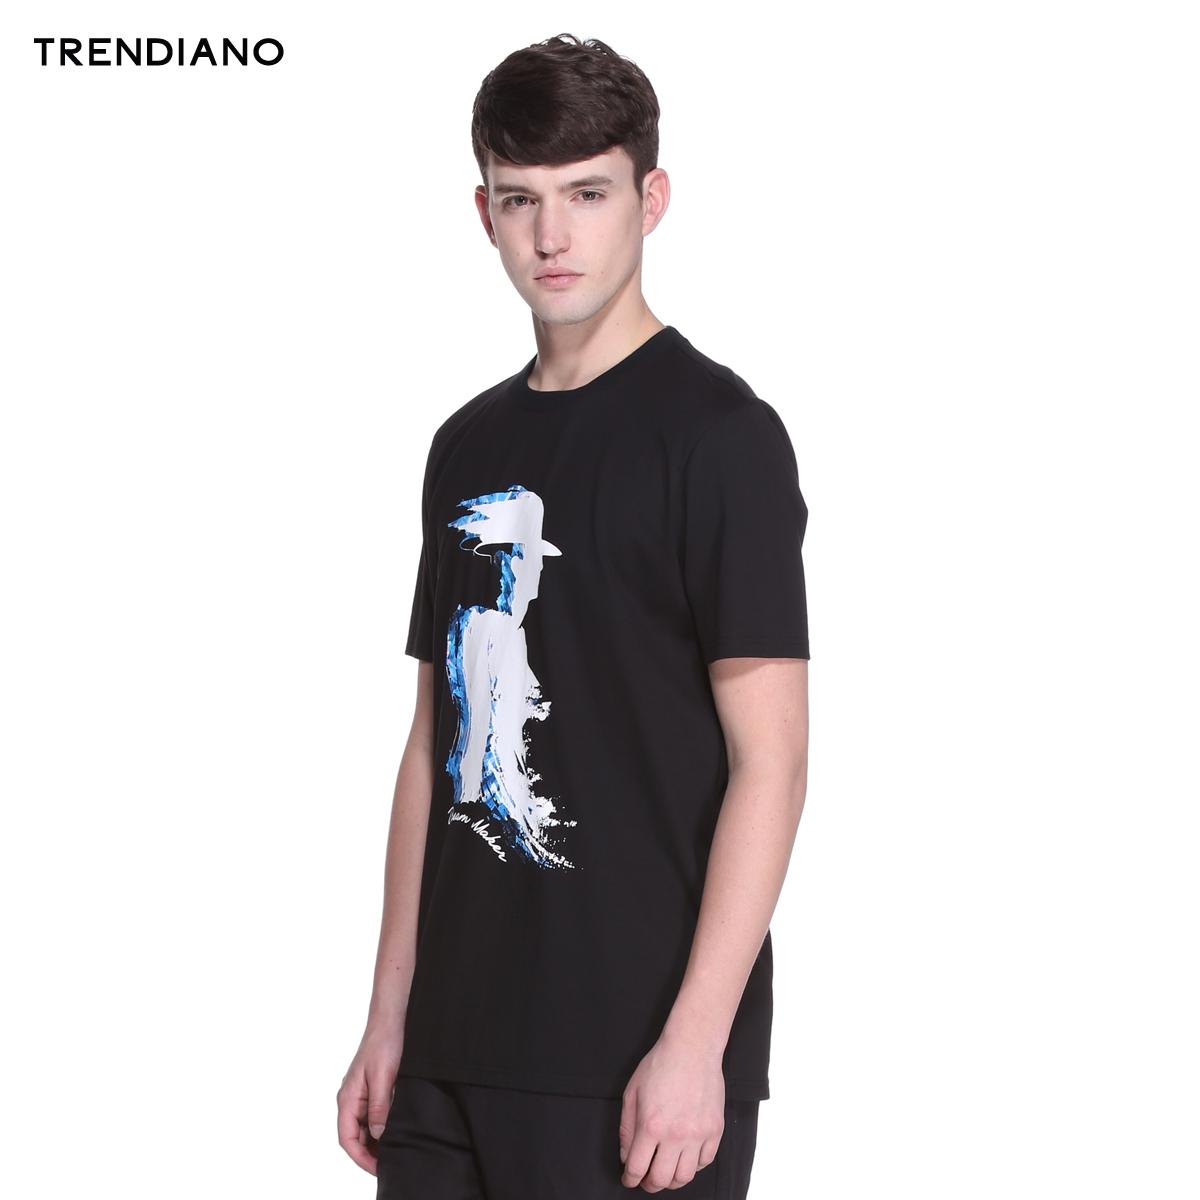 trendiano 字母純棉撞色圓領t恤